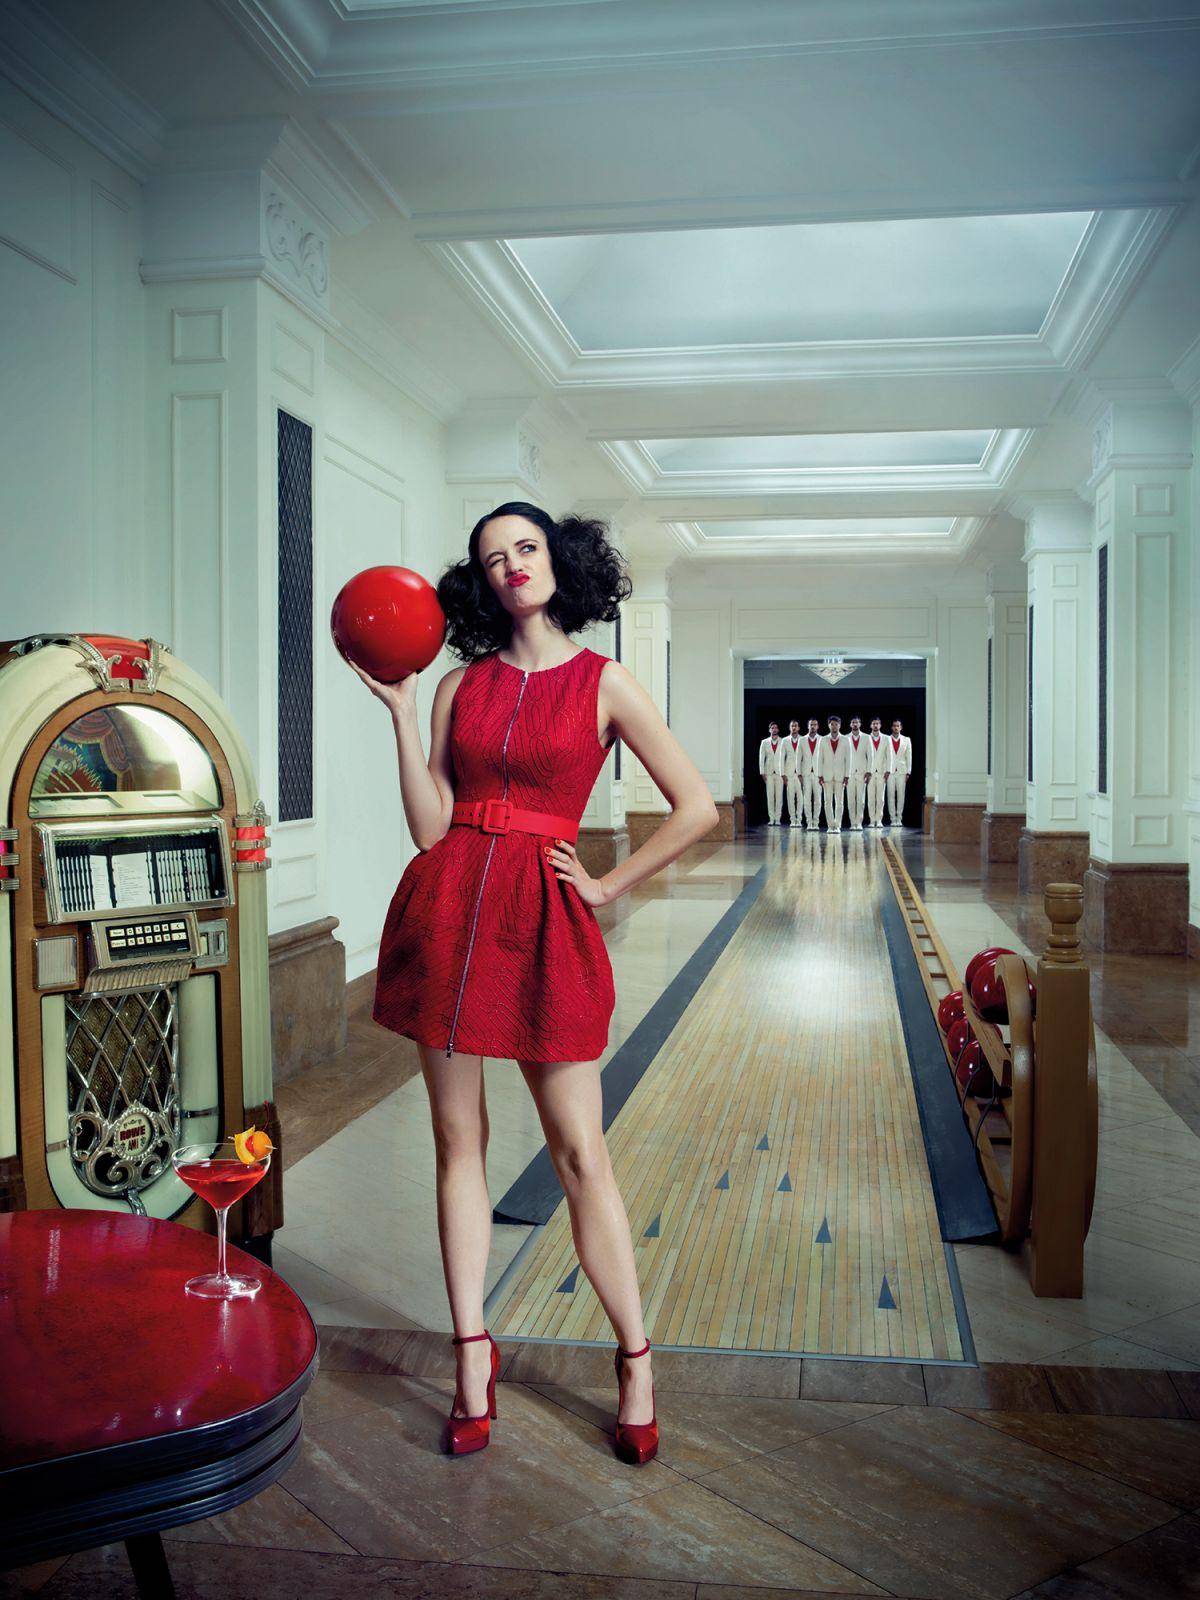 Red Dress Girl Wallpaper Eva Green 2015 Campari Calendar